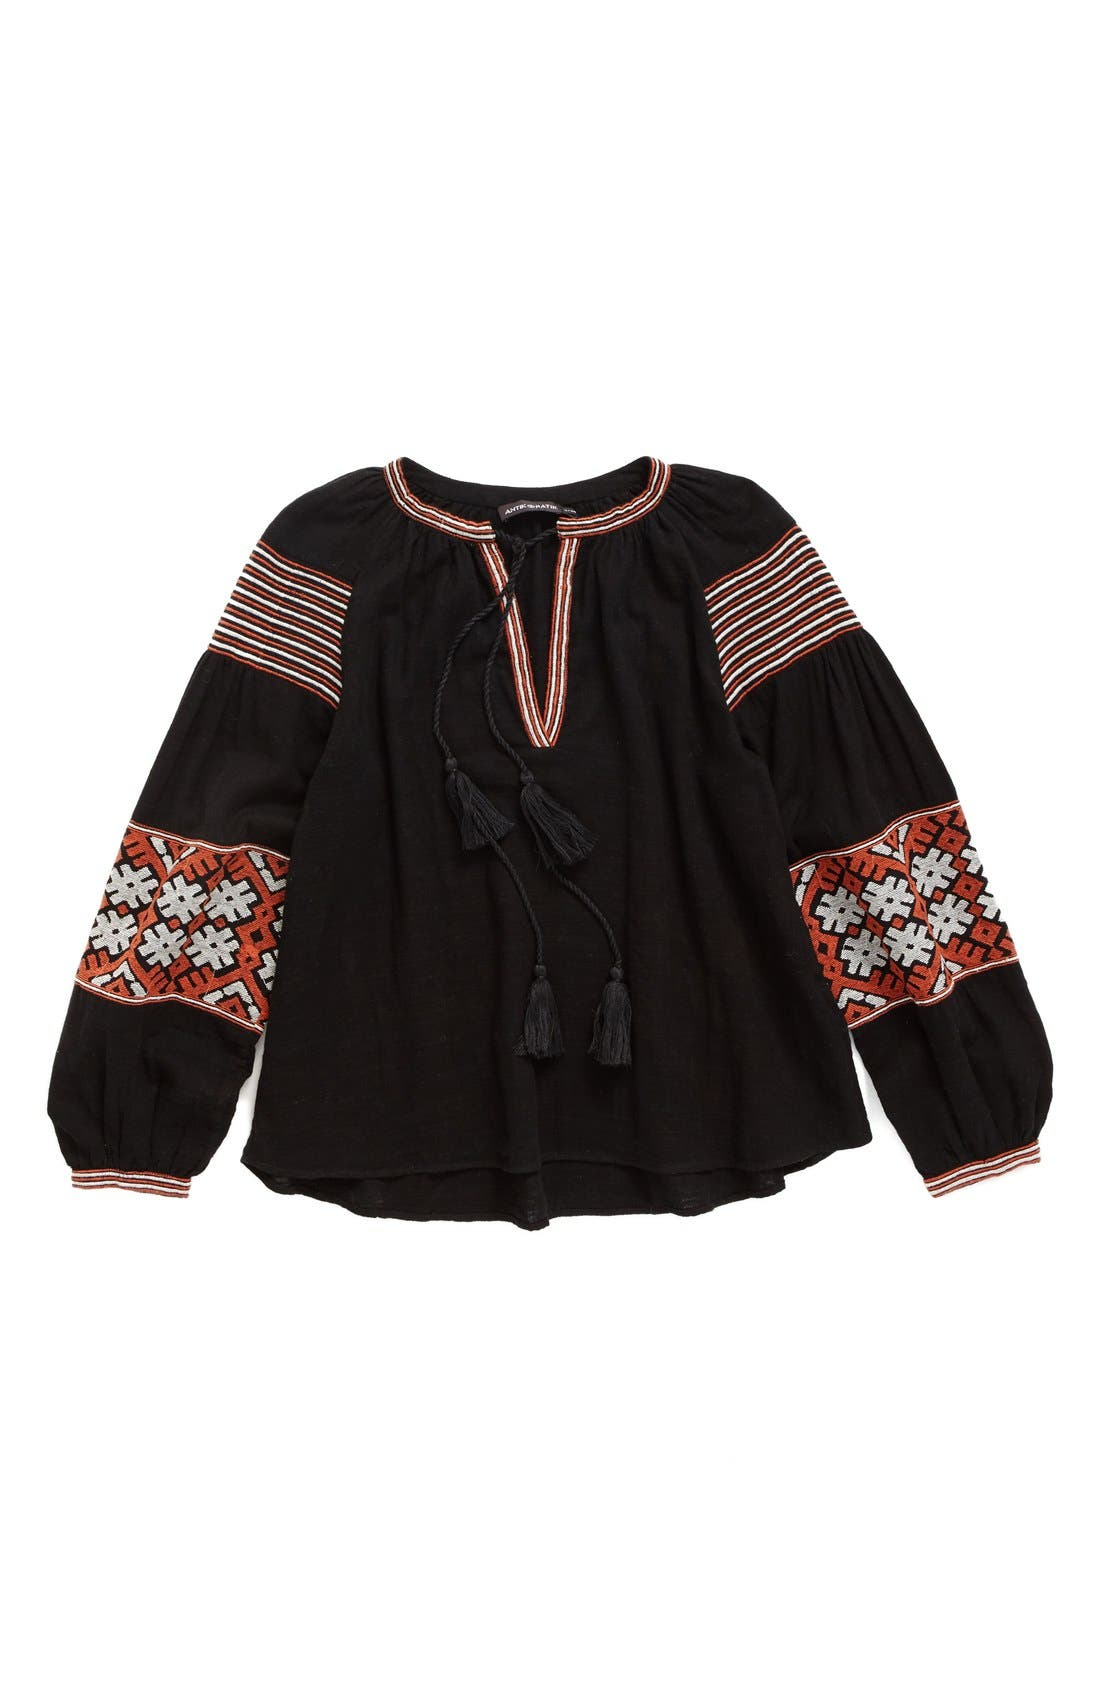 Alternate Image 1 Selected - Antik Batik Modi Blouse